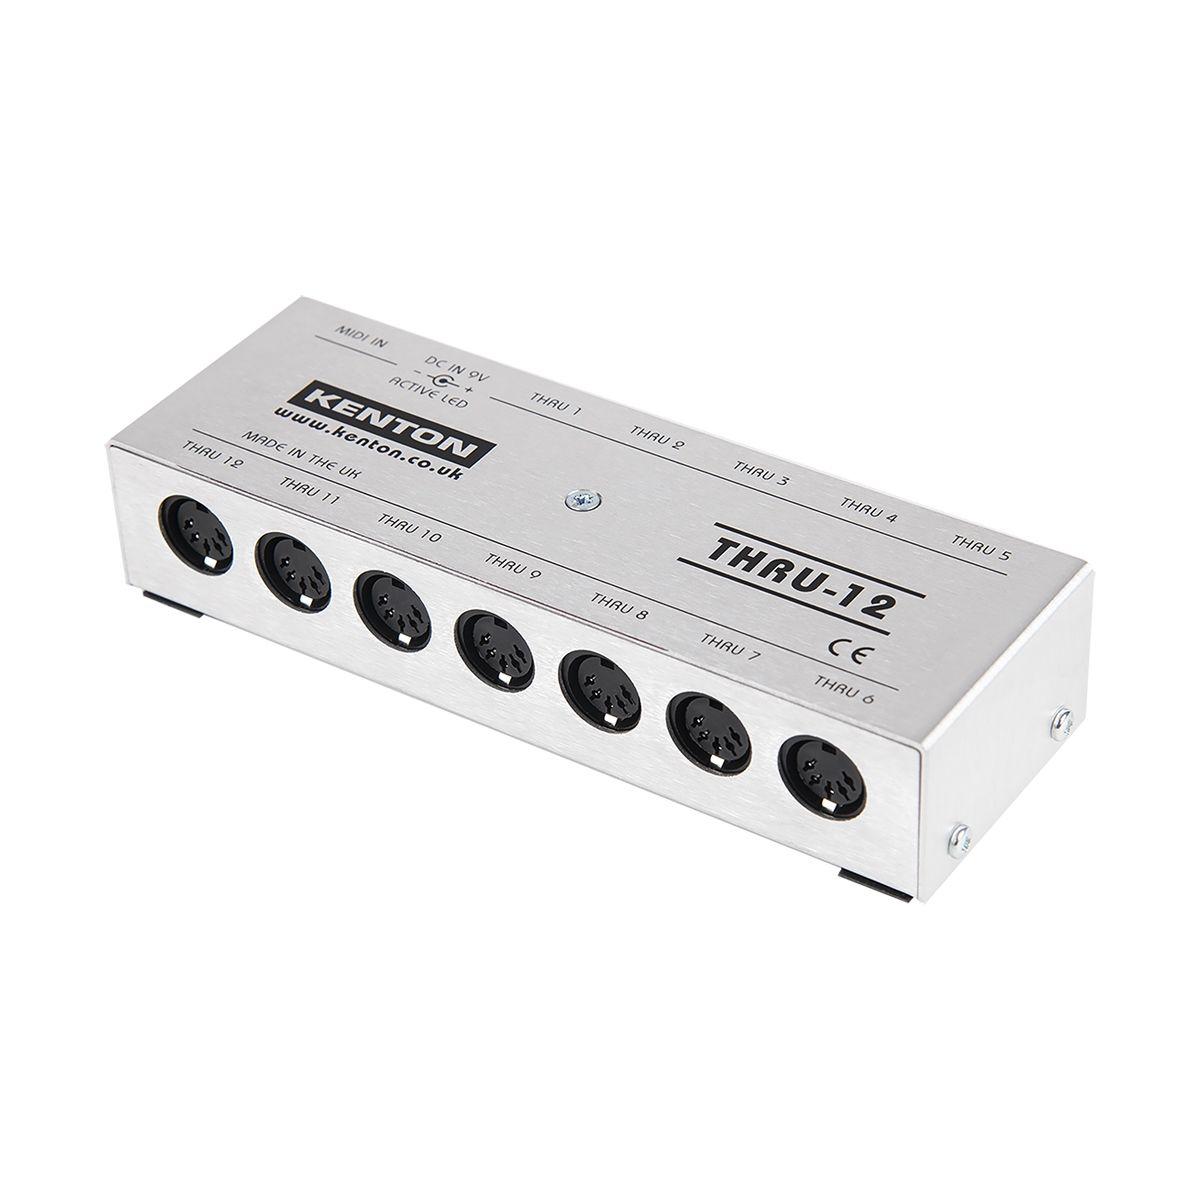 Kenton ElectronicsTHRU-12 MIDI Thru Box